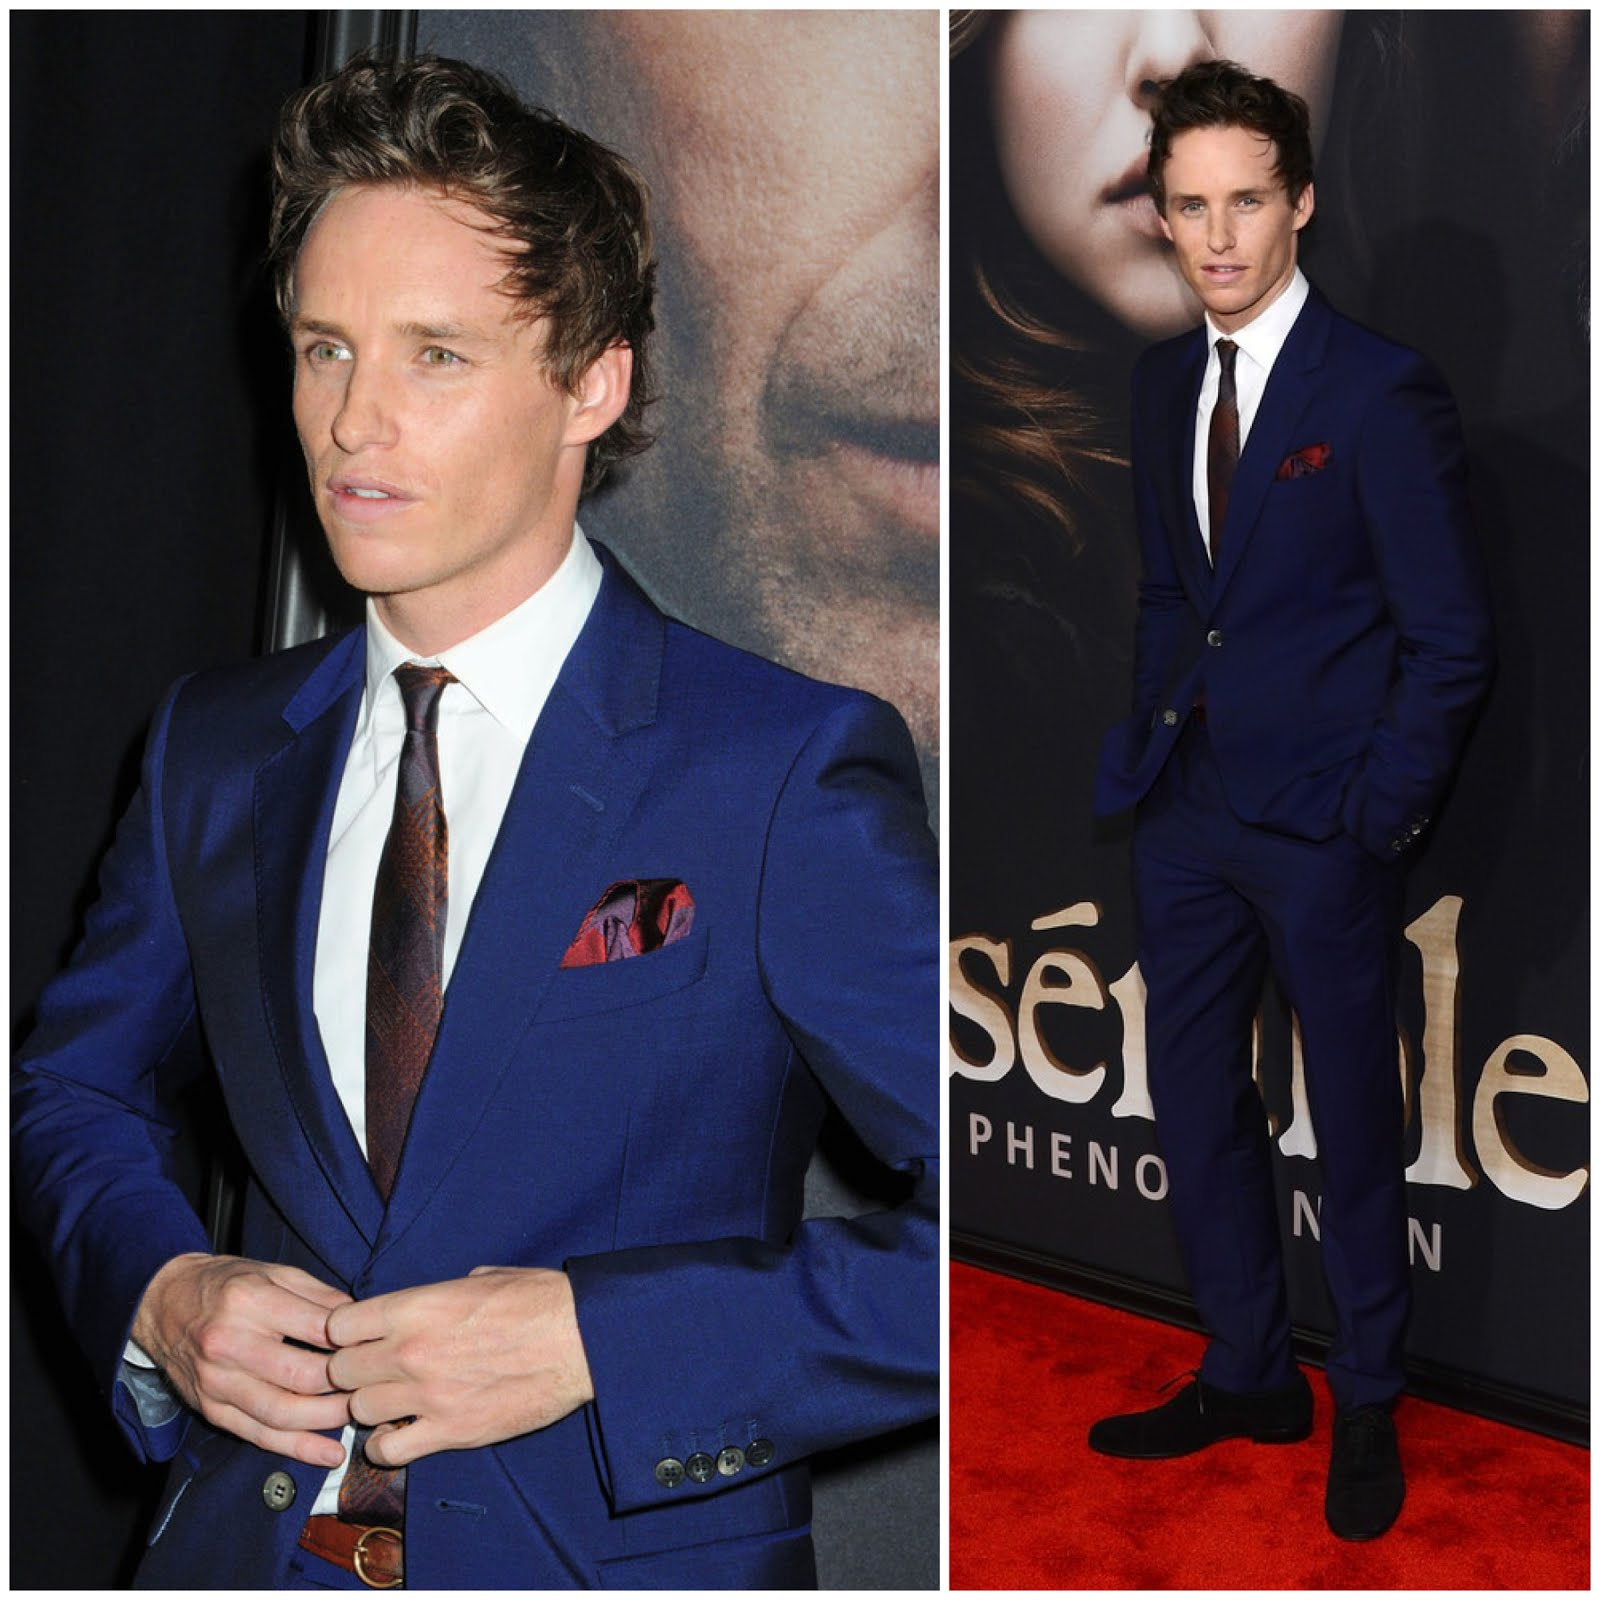 00O00 London Menswear Blog Eddie Redmayne in Alexander McQueen - 'Les Miserables' premiere, New York